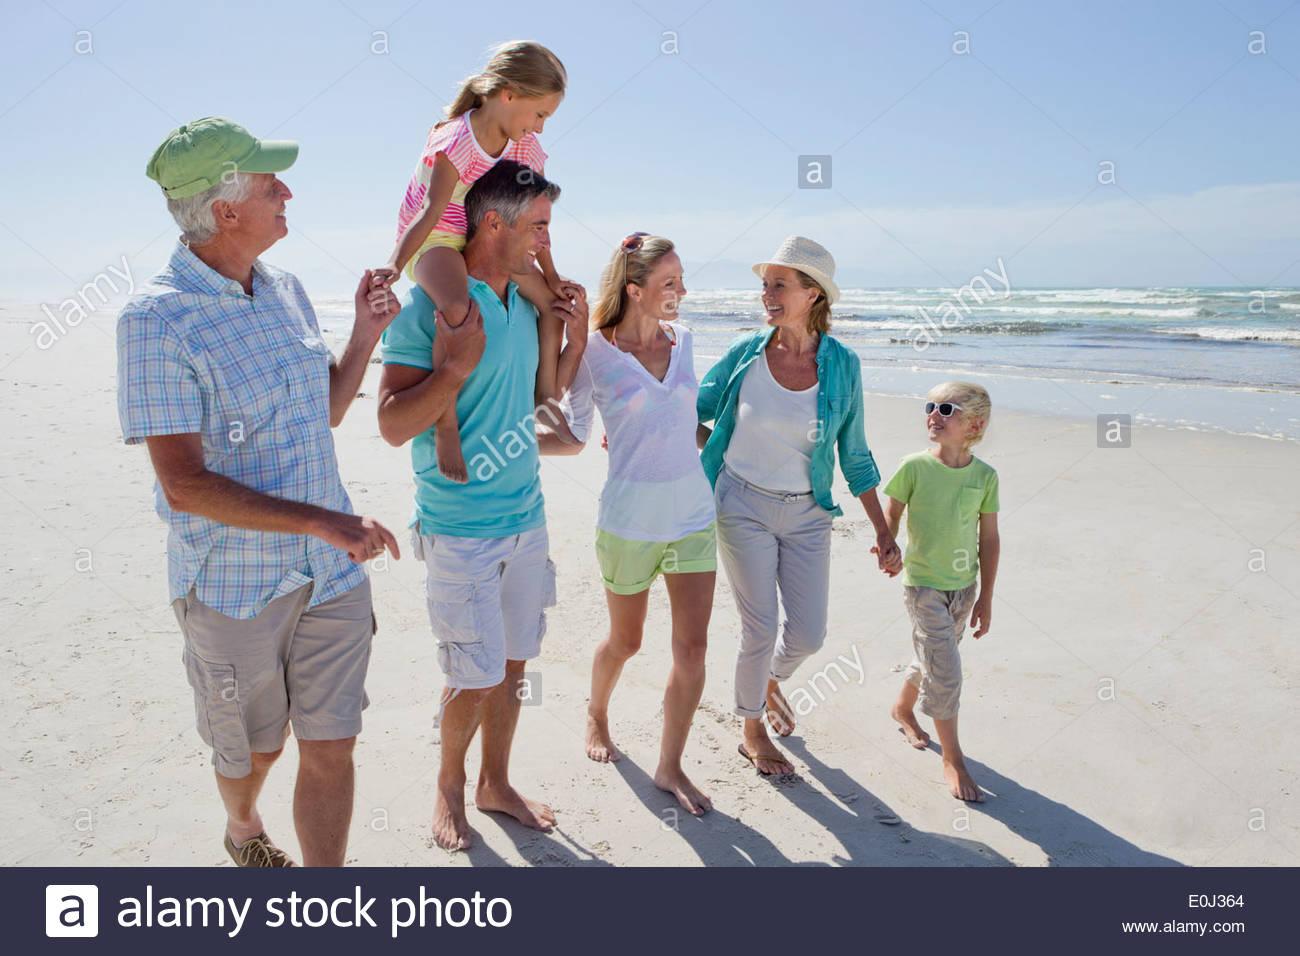 Multi-generation family walking on sunny beach - Stock Image